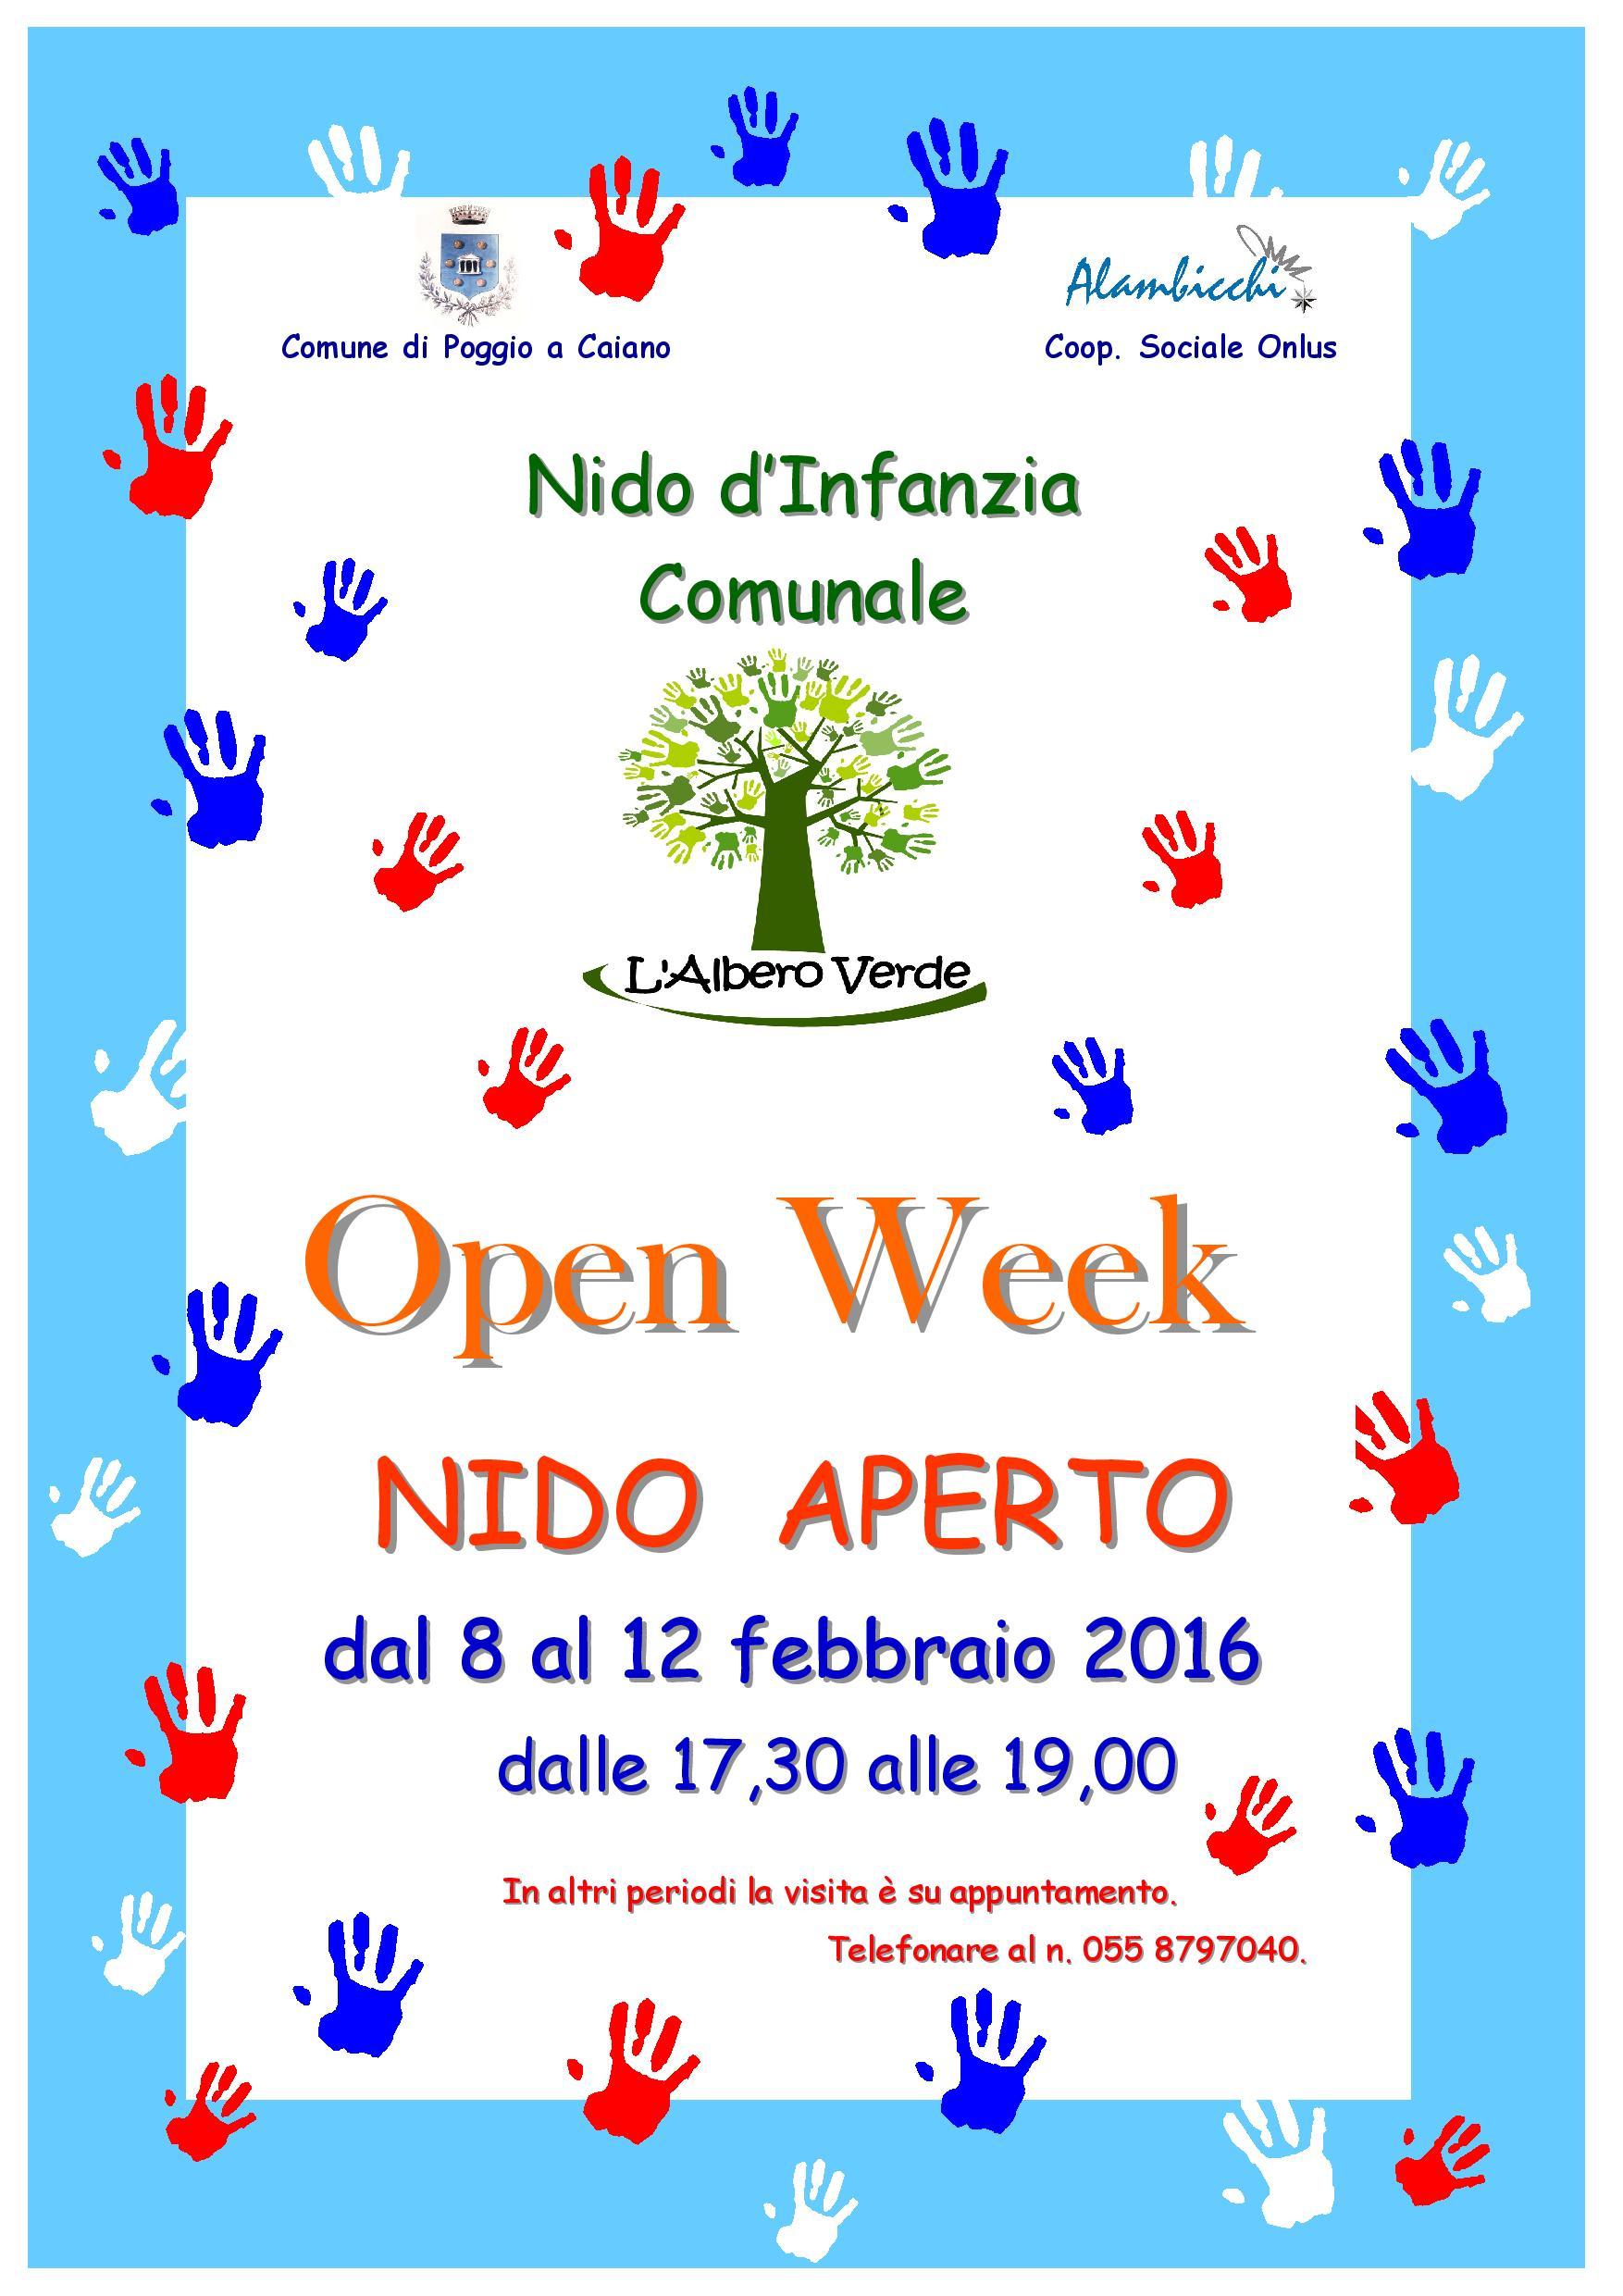 La locandina dell'open week del nido d'infanzia comunale